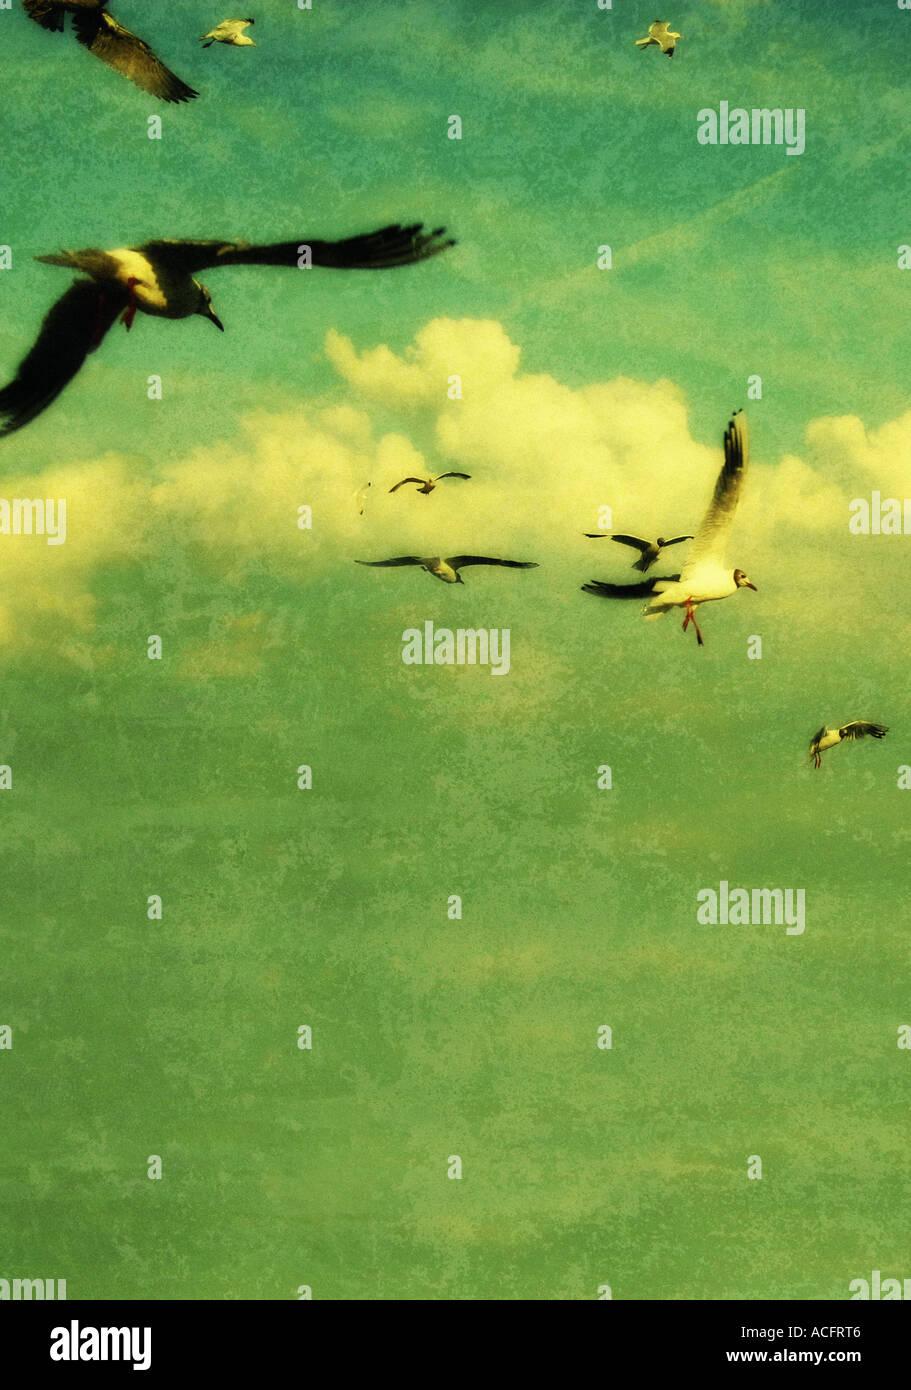 Foto de gaviotas en vuelo Imagen De Stock